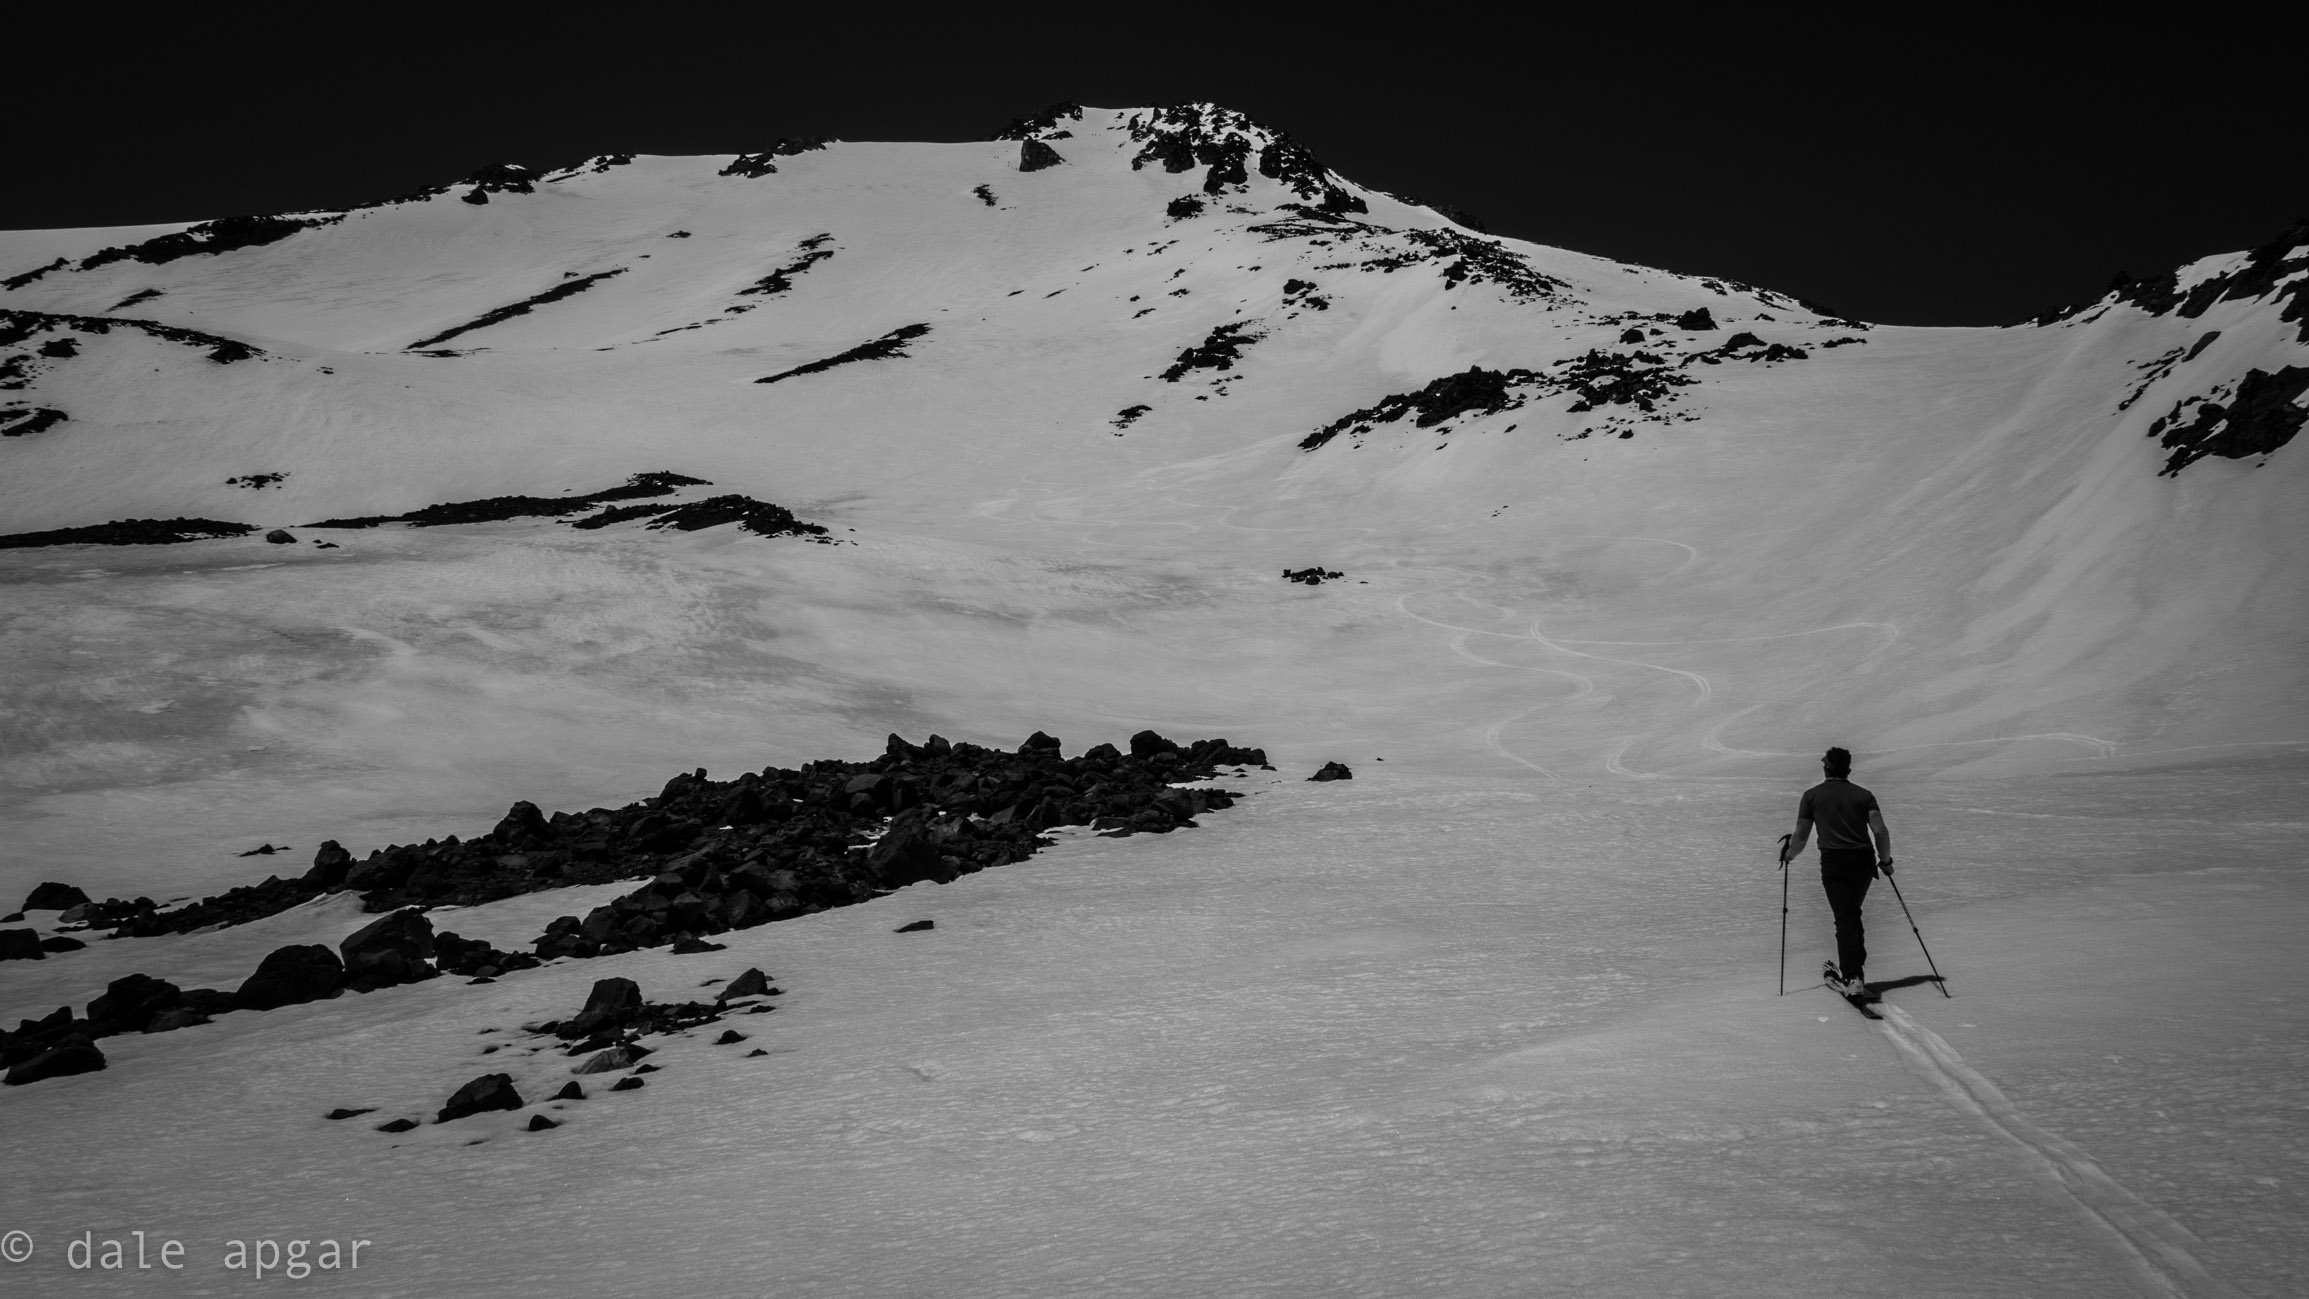 dale_apgar_ski-25.jpg